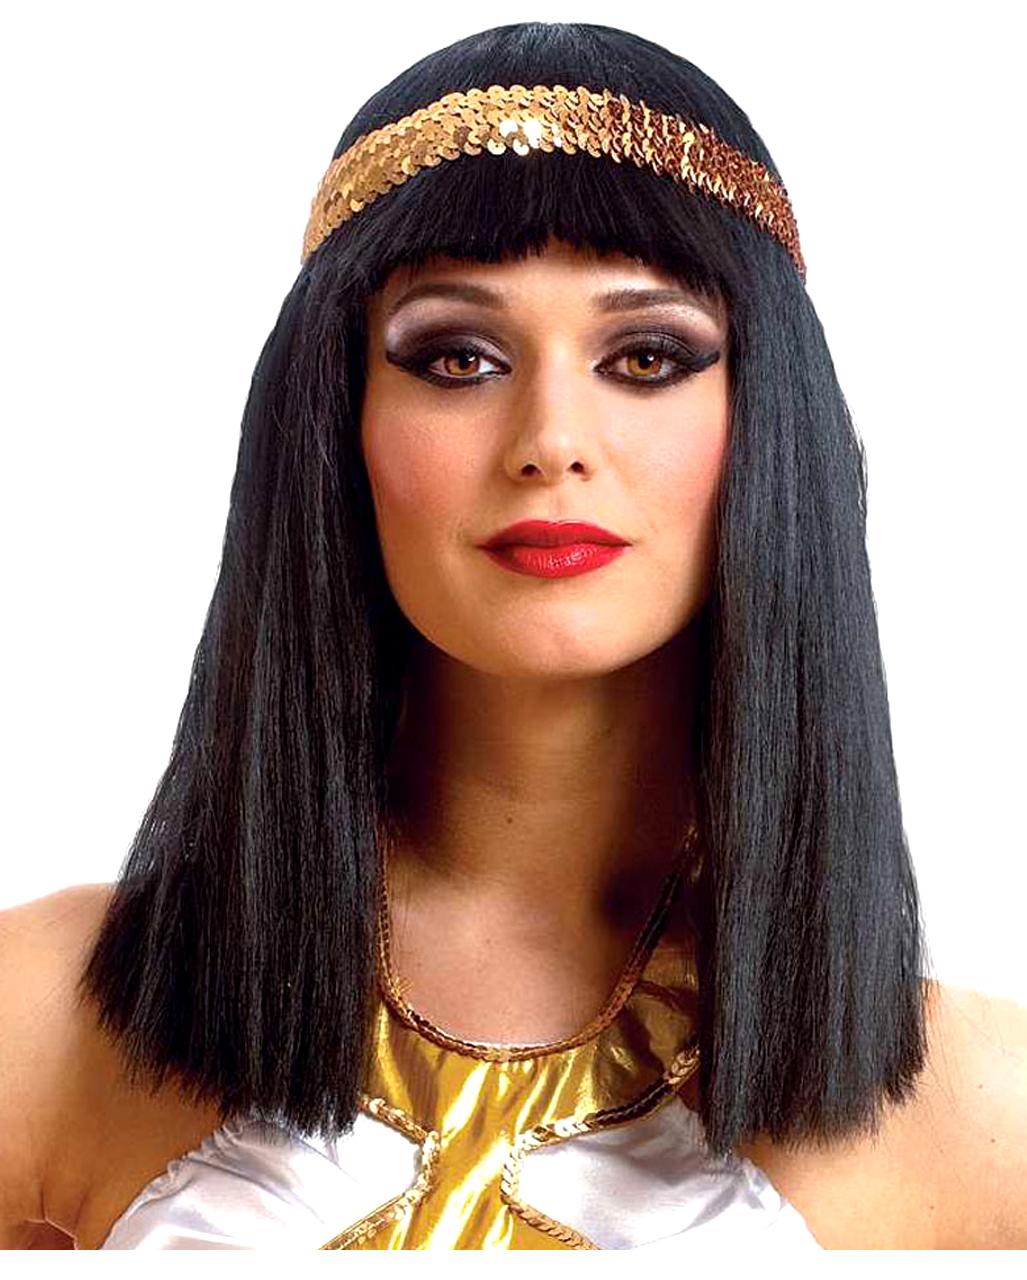 Perucke Damen Karneval Schwarz Pony Glatt Goldfarbenes Stirnband